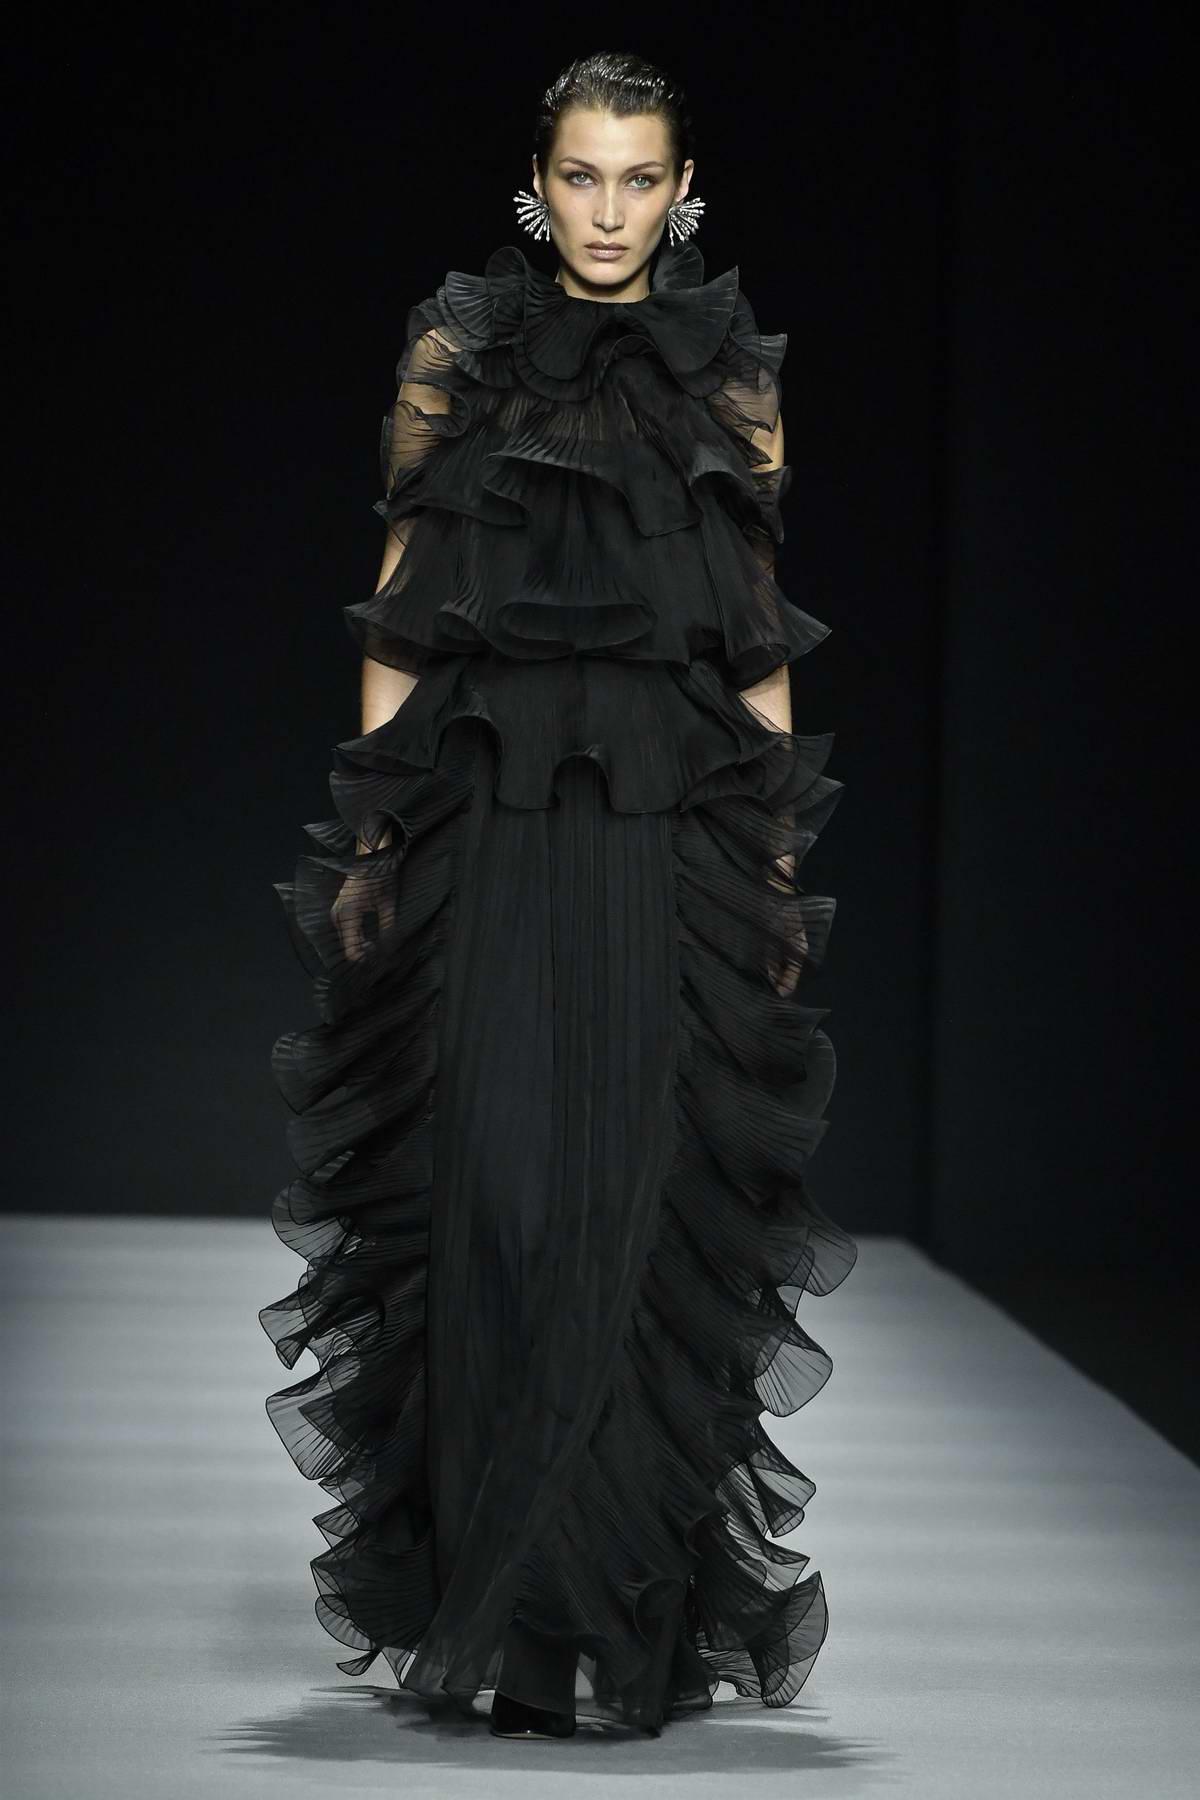 Bella Hadid walks the Alberta Ferretti runway during F/W 2020 Milan Fashion Week in Milan, Italy